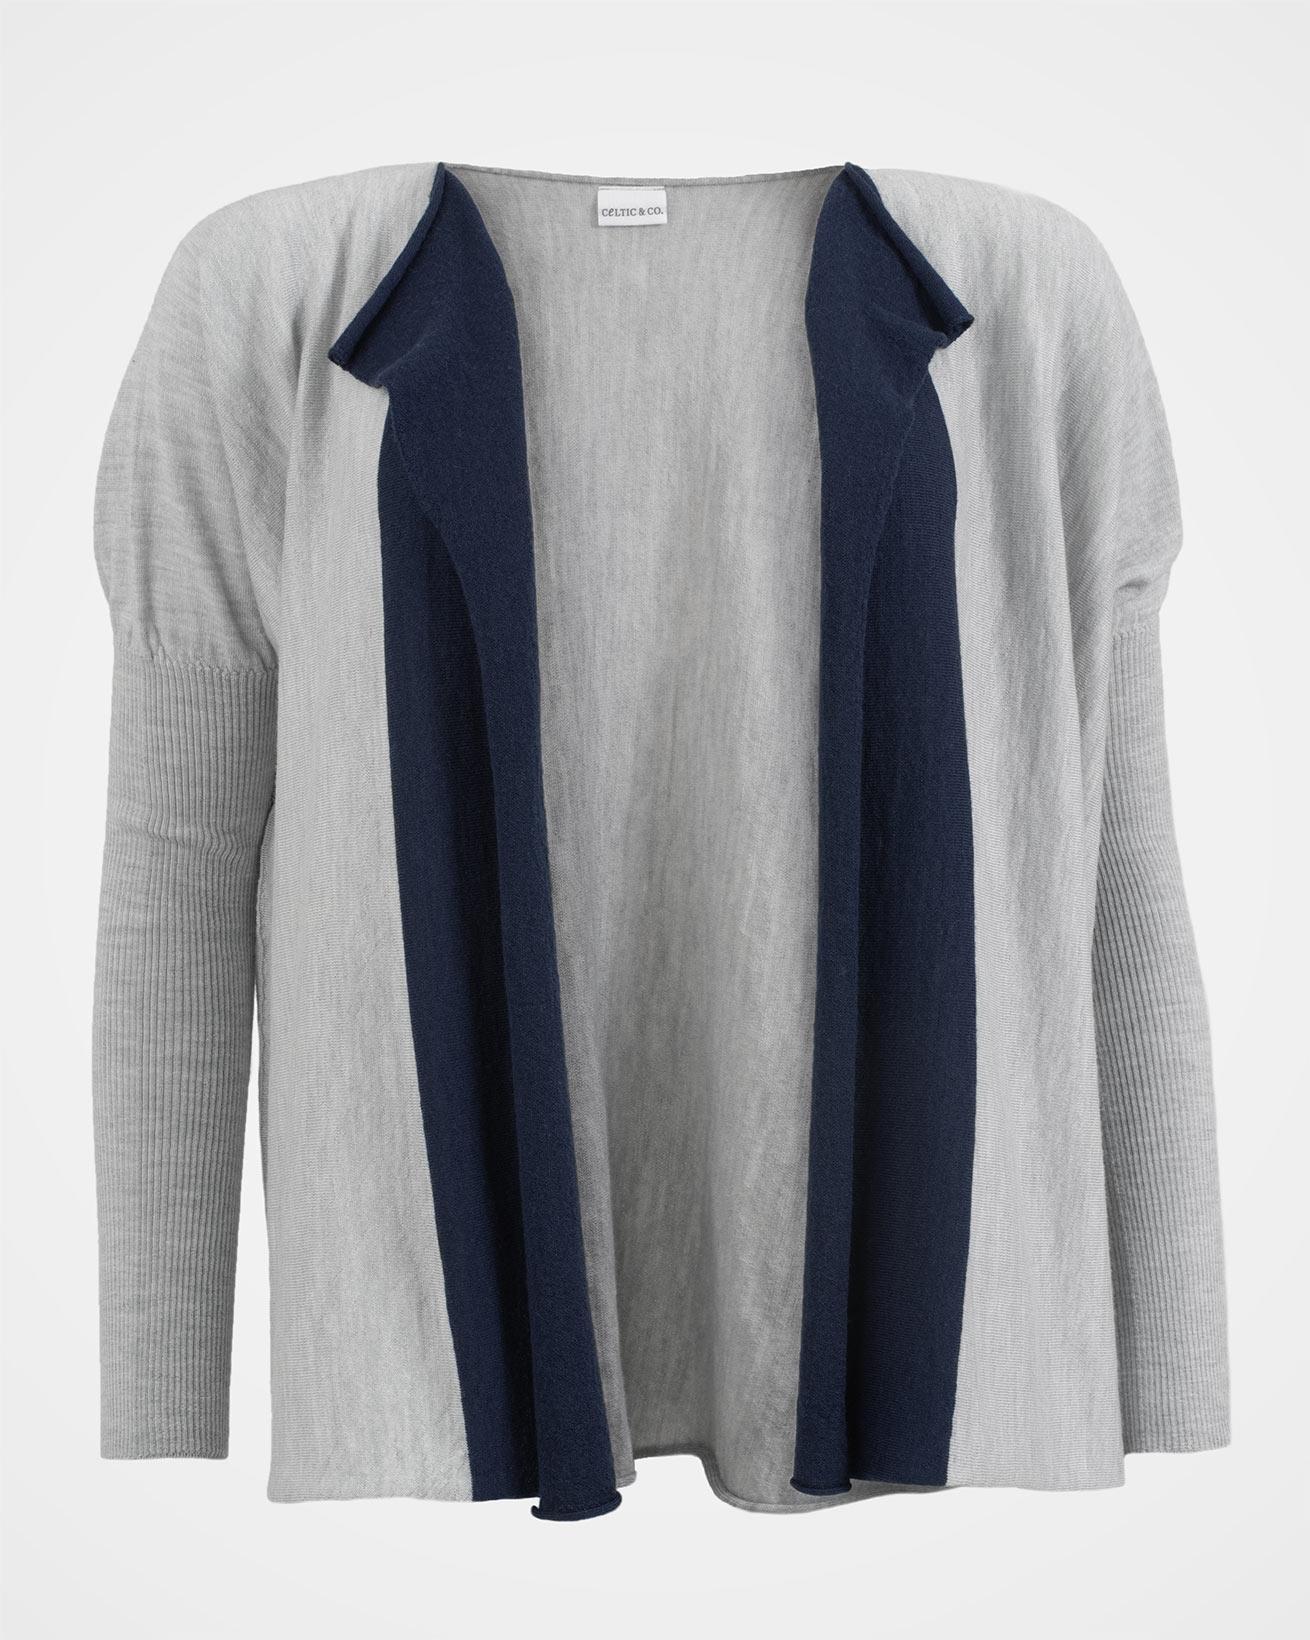 7667_fine-knit-edge-to-edge-cardi_indigo-pearl-grey_front.jpg